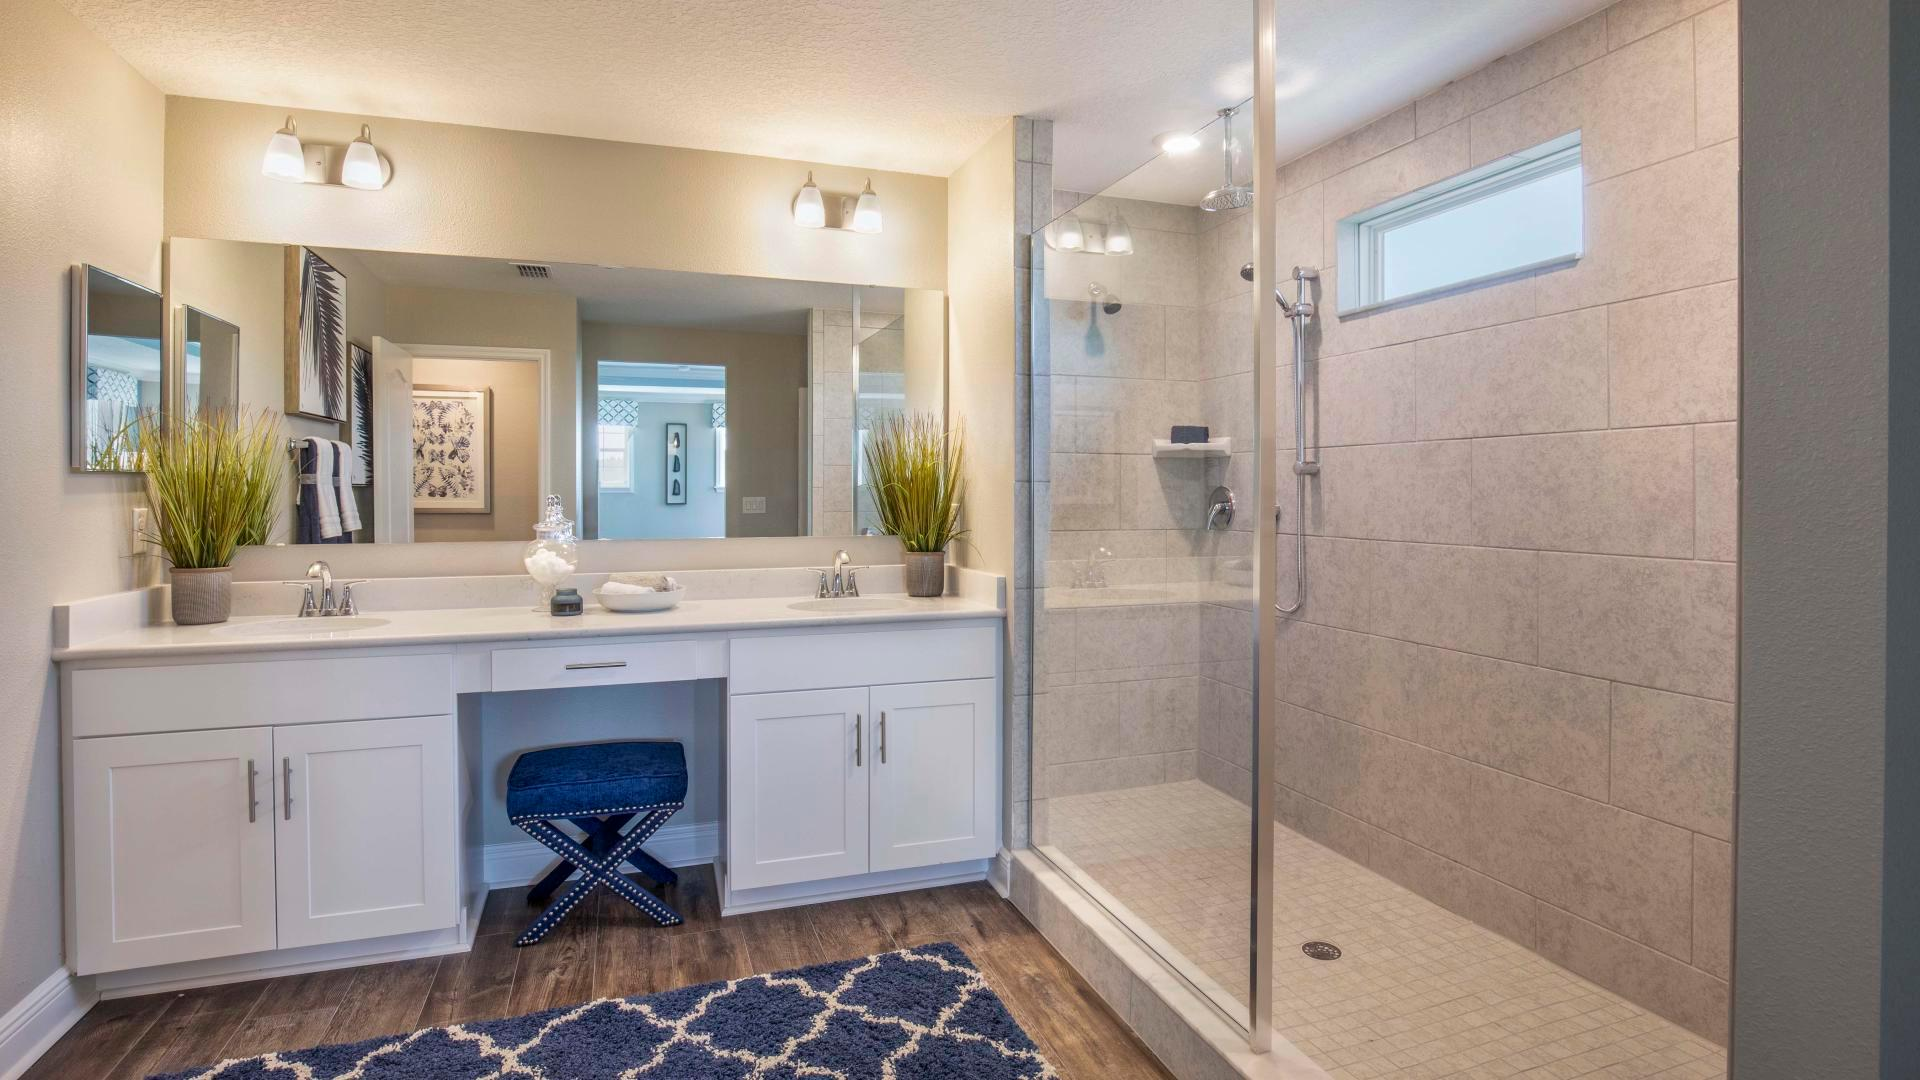 Bathroom featured in the Columbus By Maronda Homes in Daytona Beach, FL